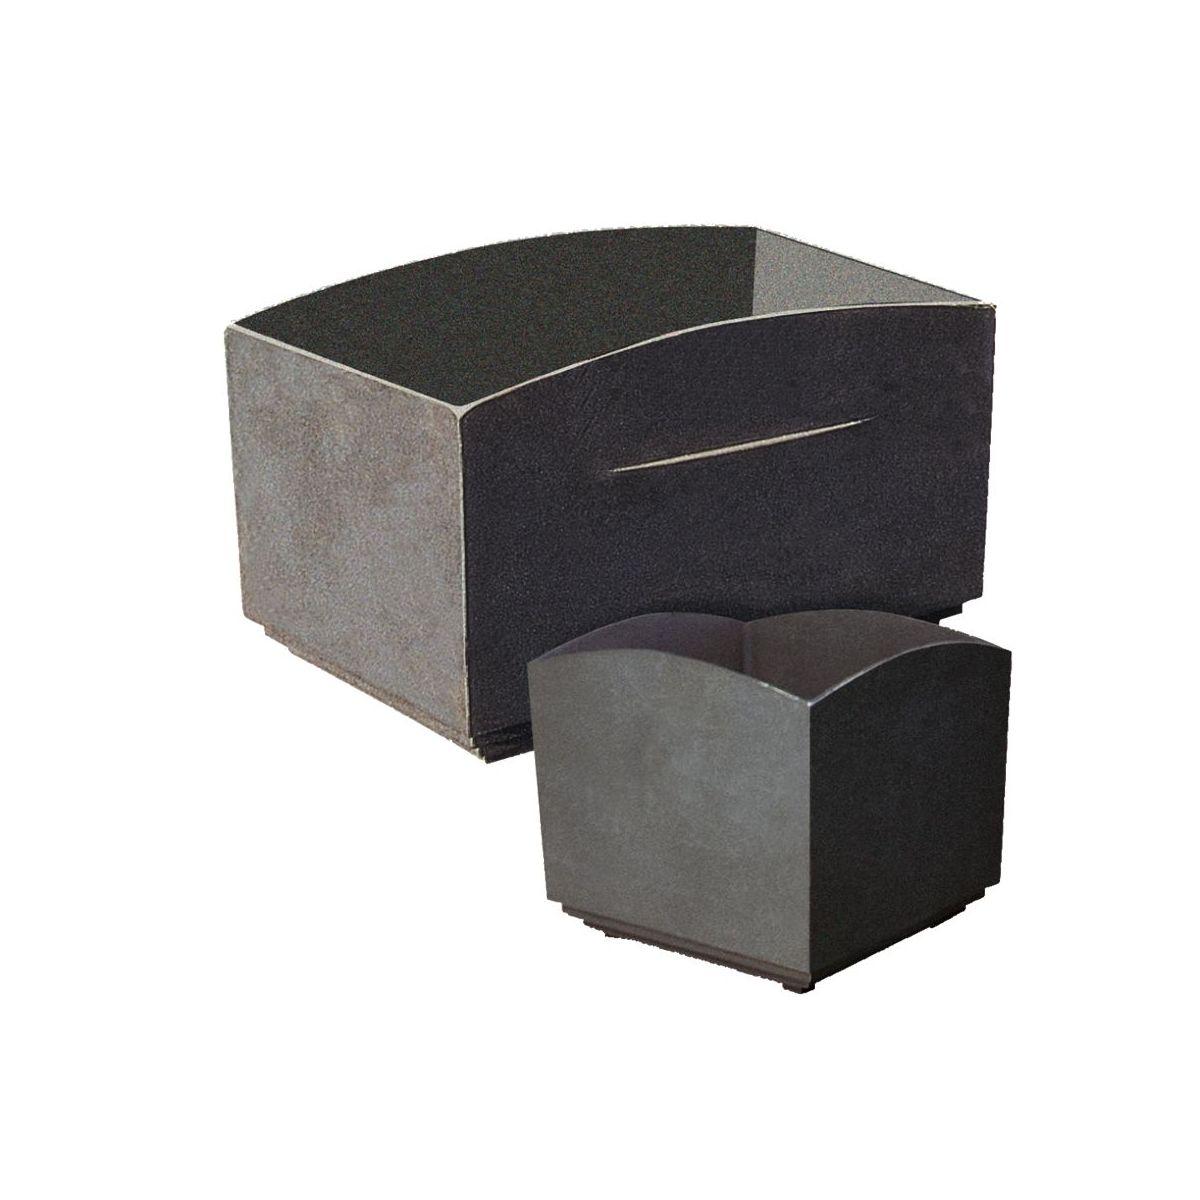 Rectangular flower box of casting Valladolid V-1